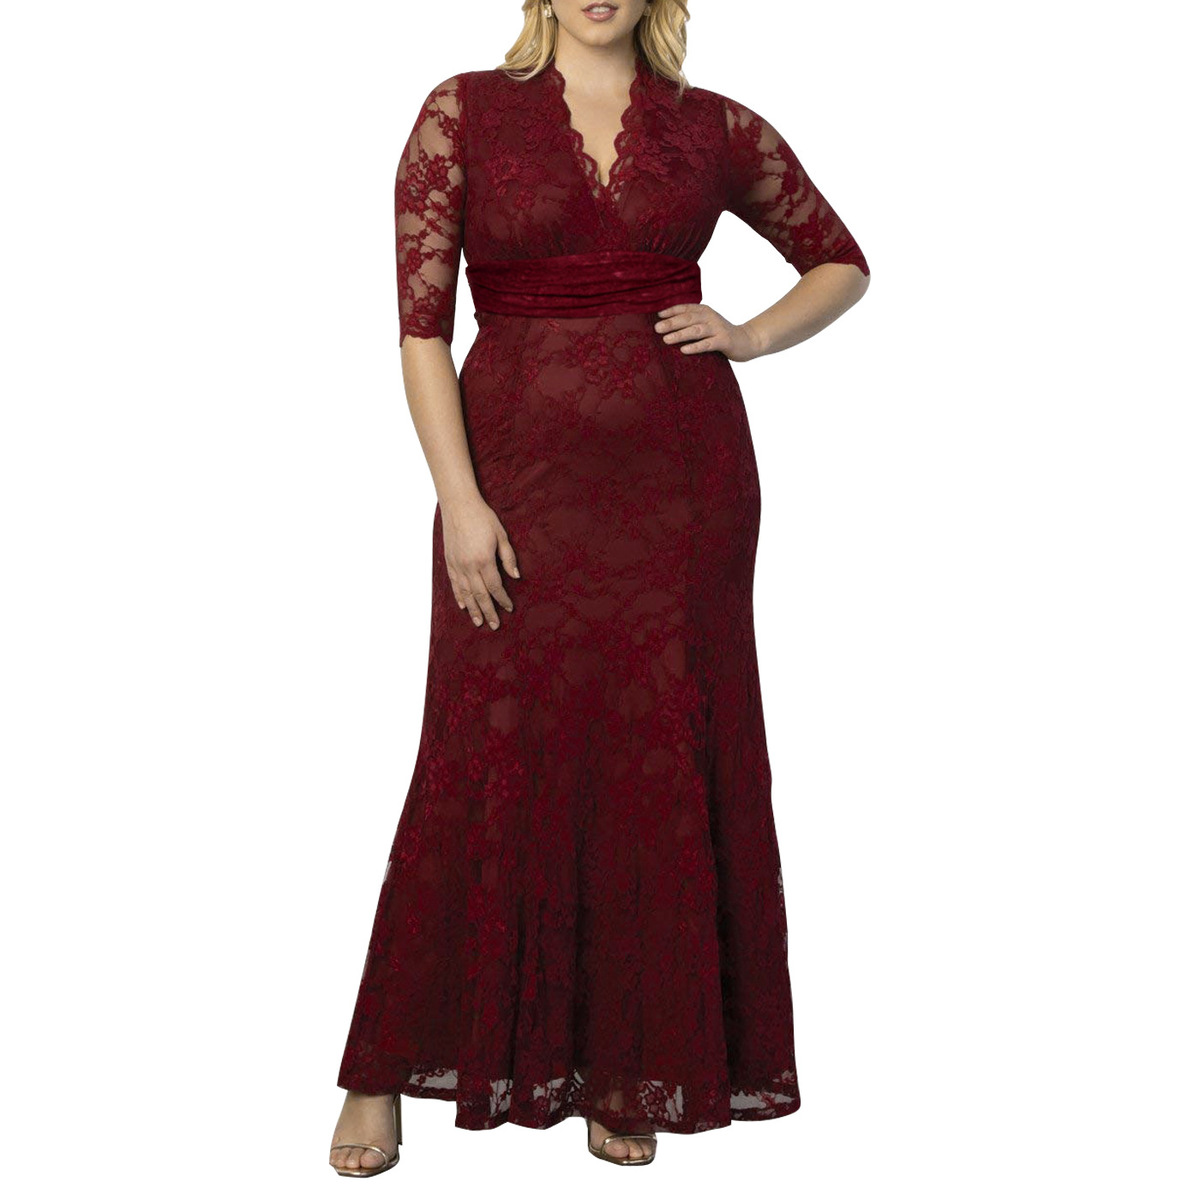 Bride Dresses Elegant Formal Party Gowns 1